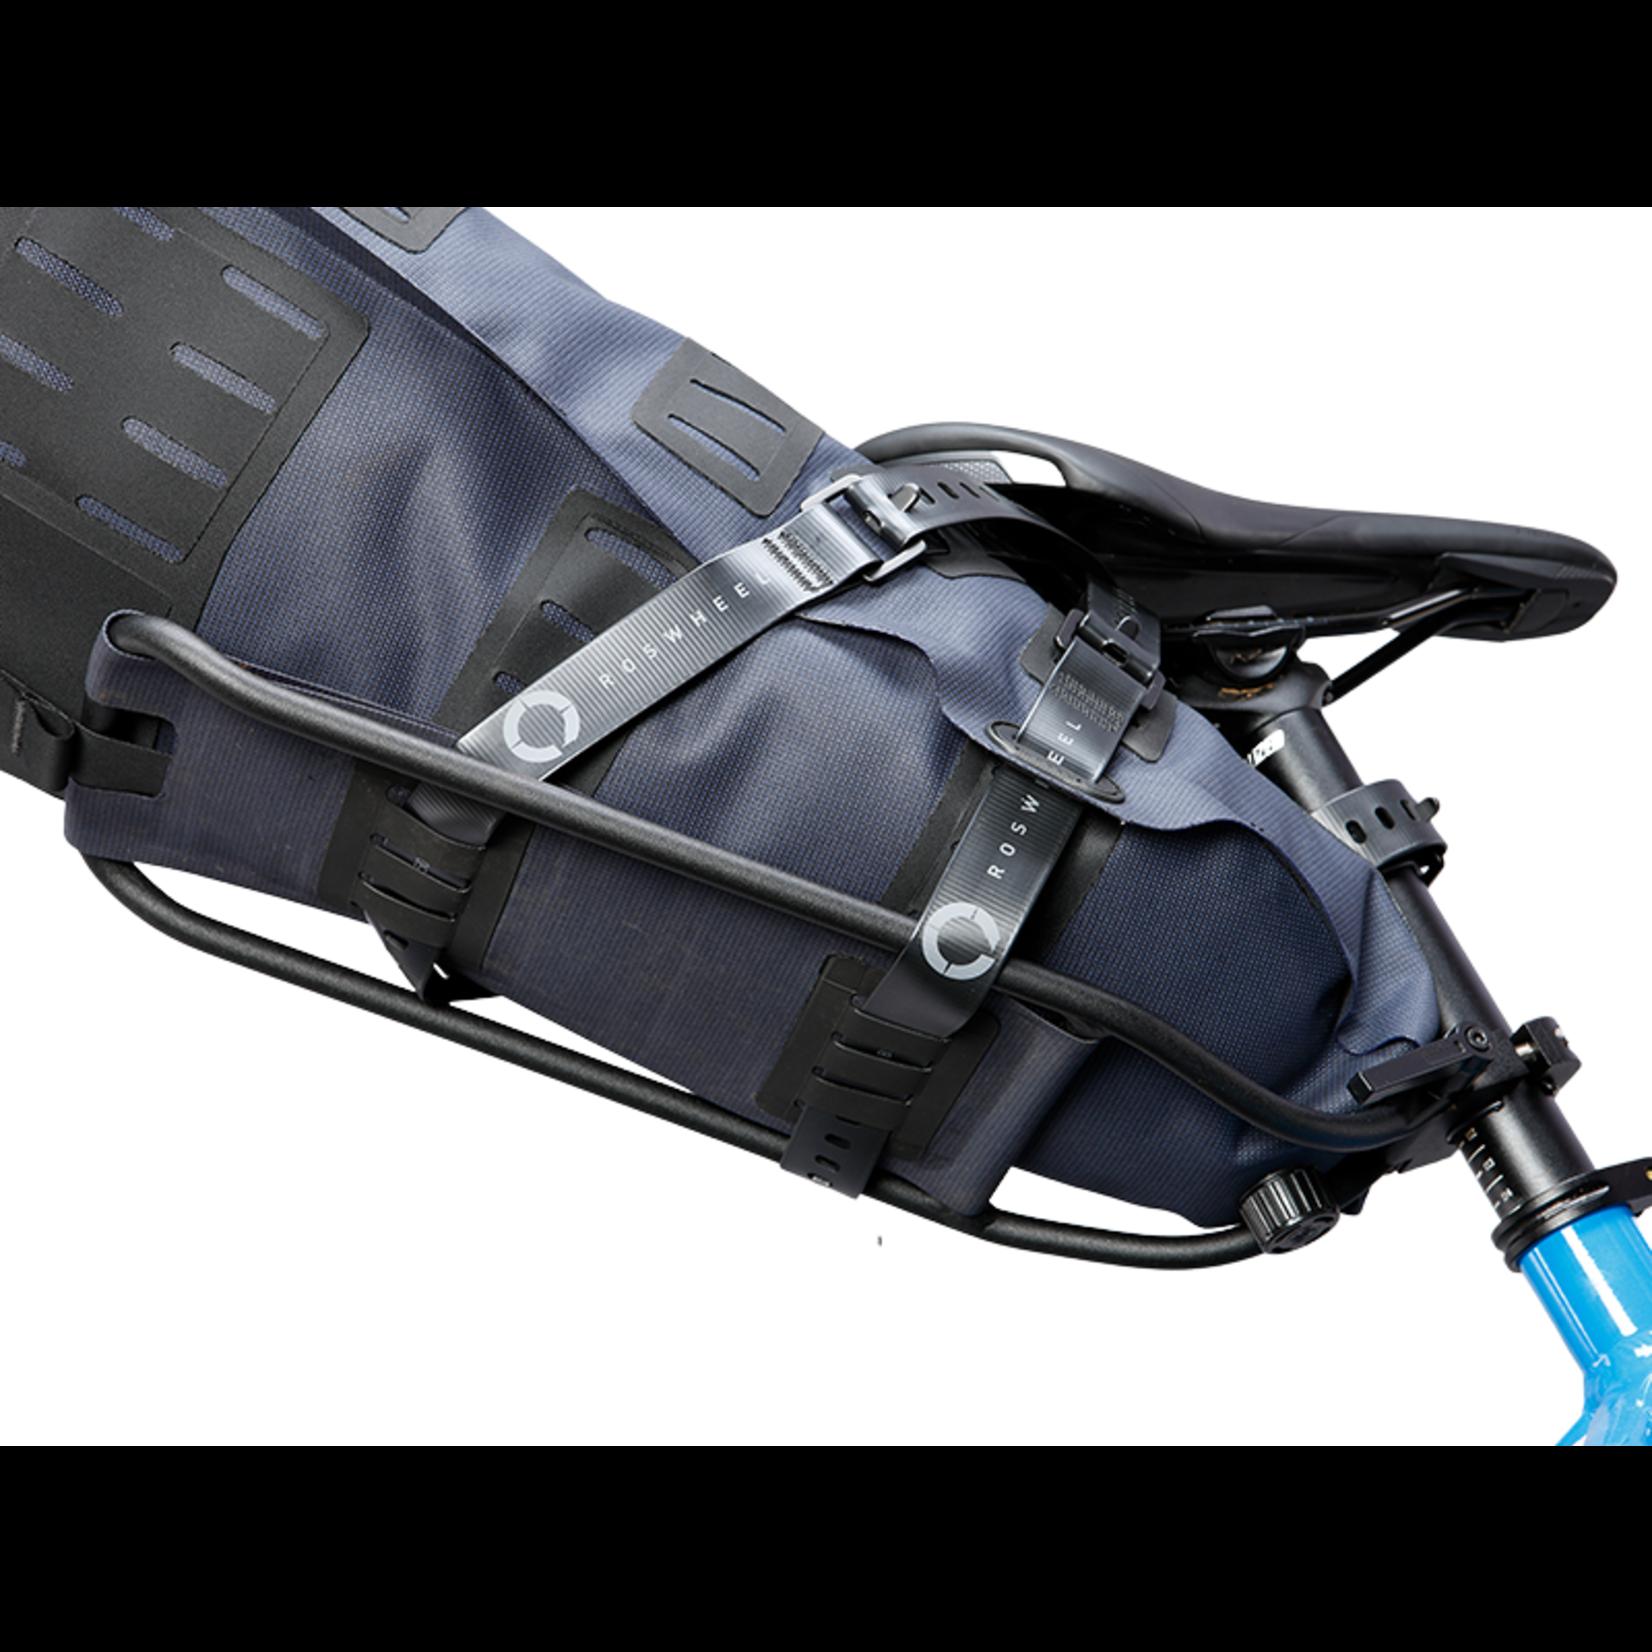 Roswheel Roswheel Off-Road Seat Pack & Rack